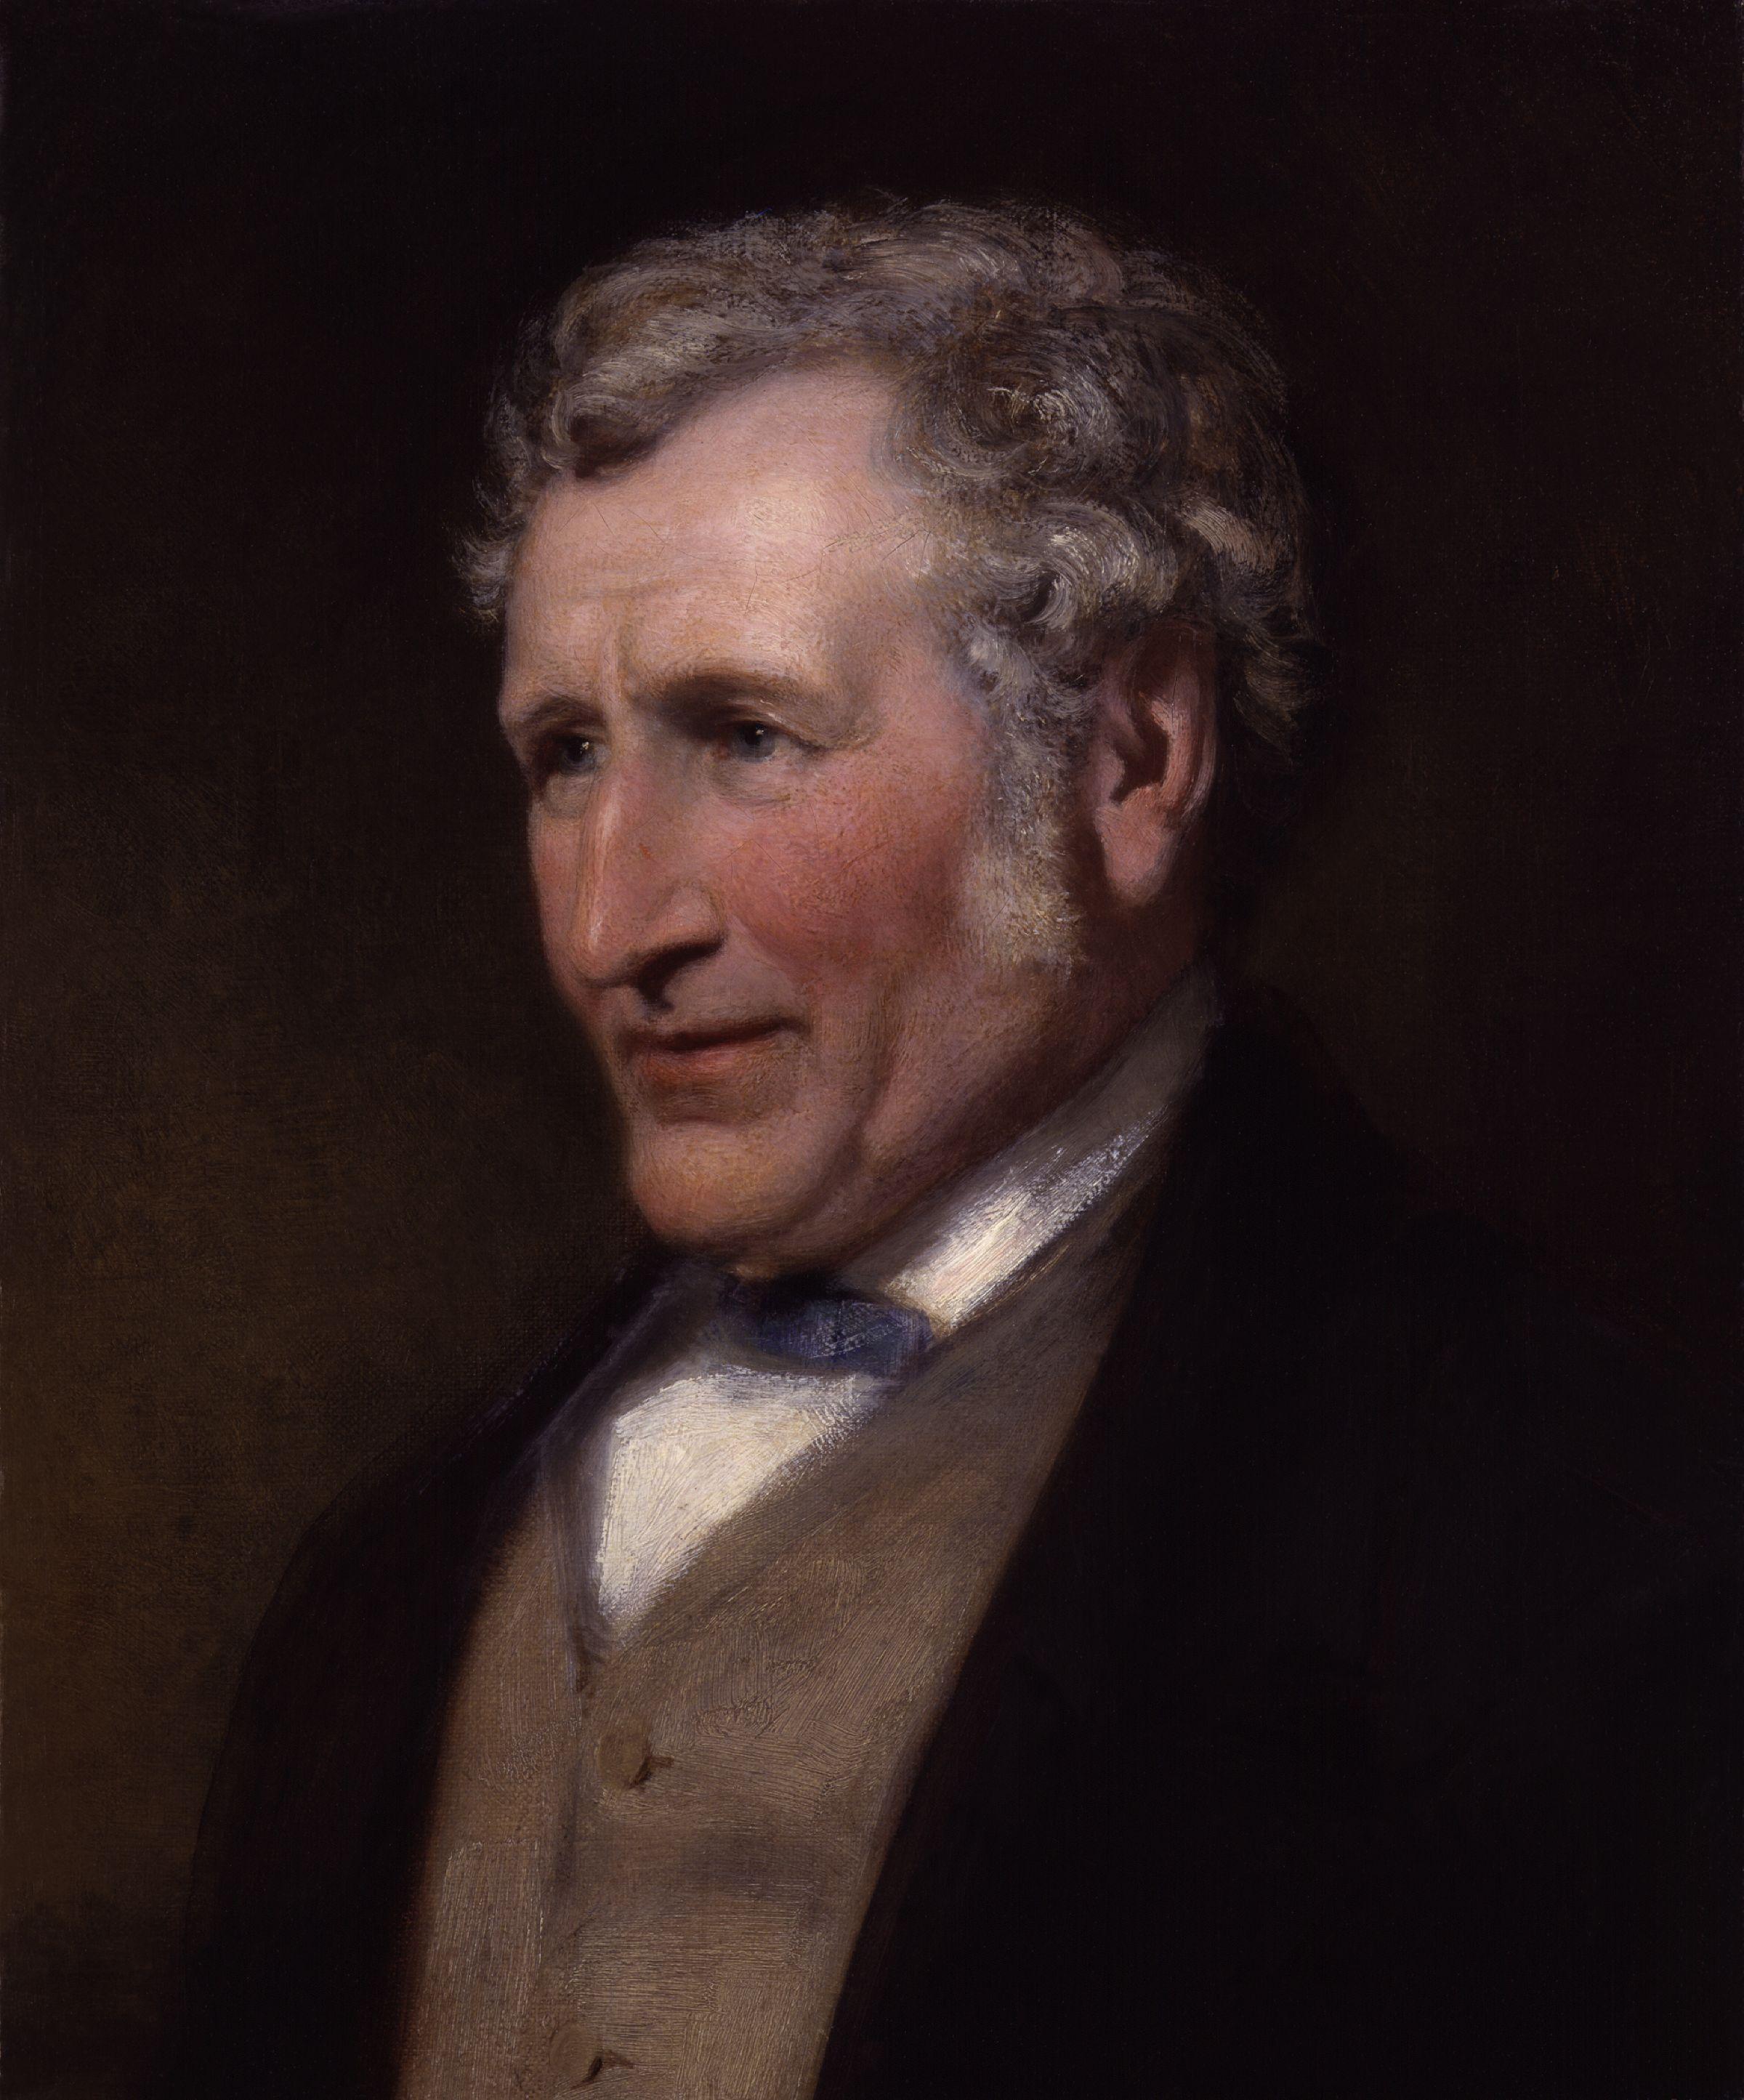 Image of James Hall Nasmyth from Wikidata